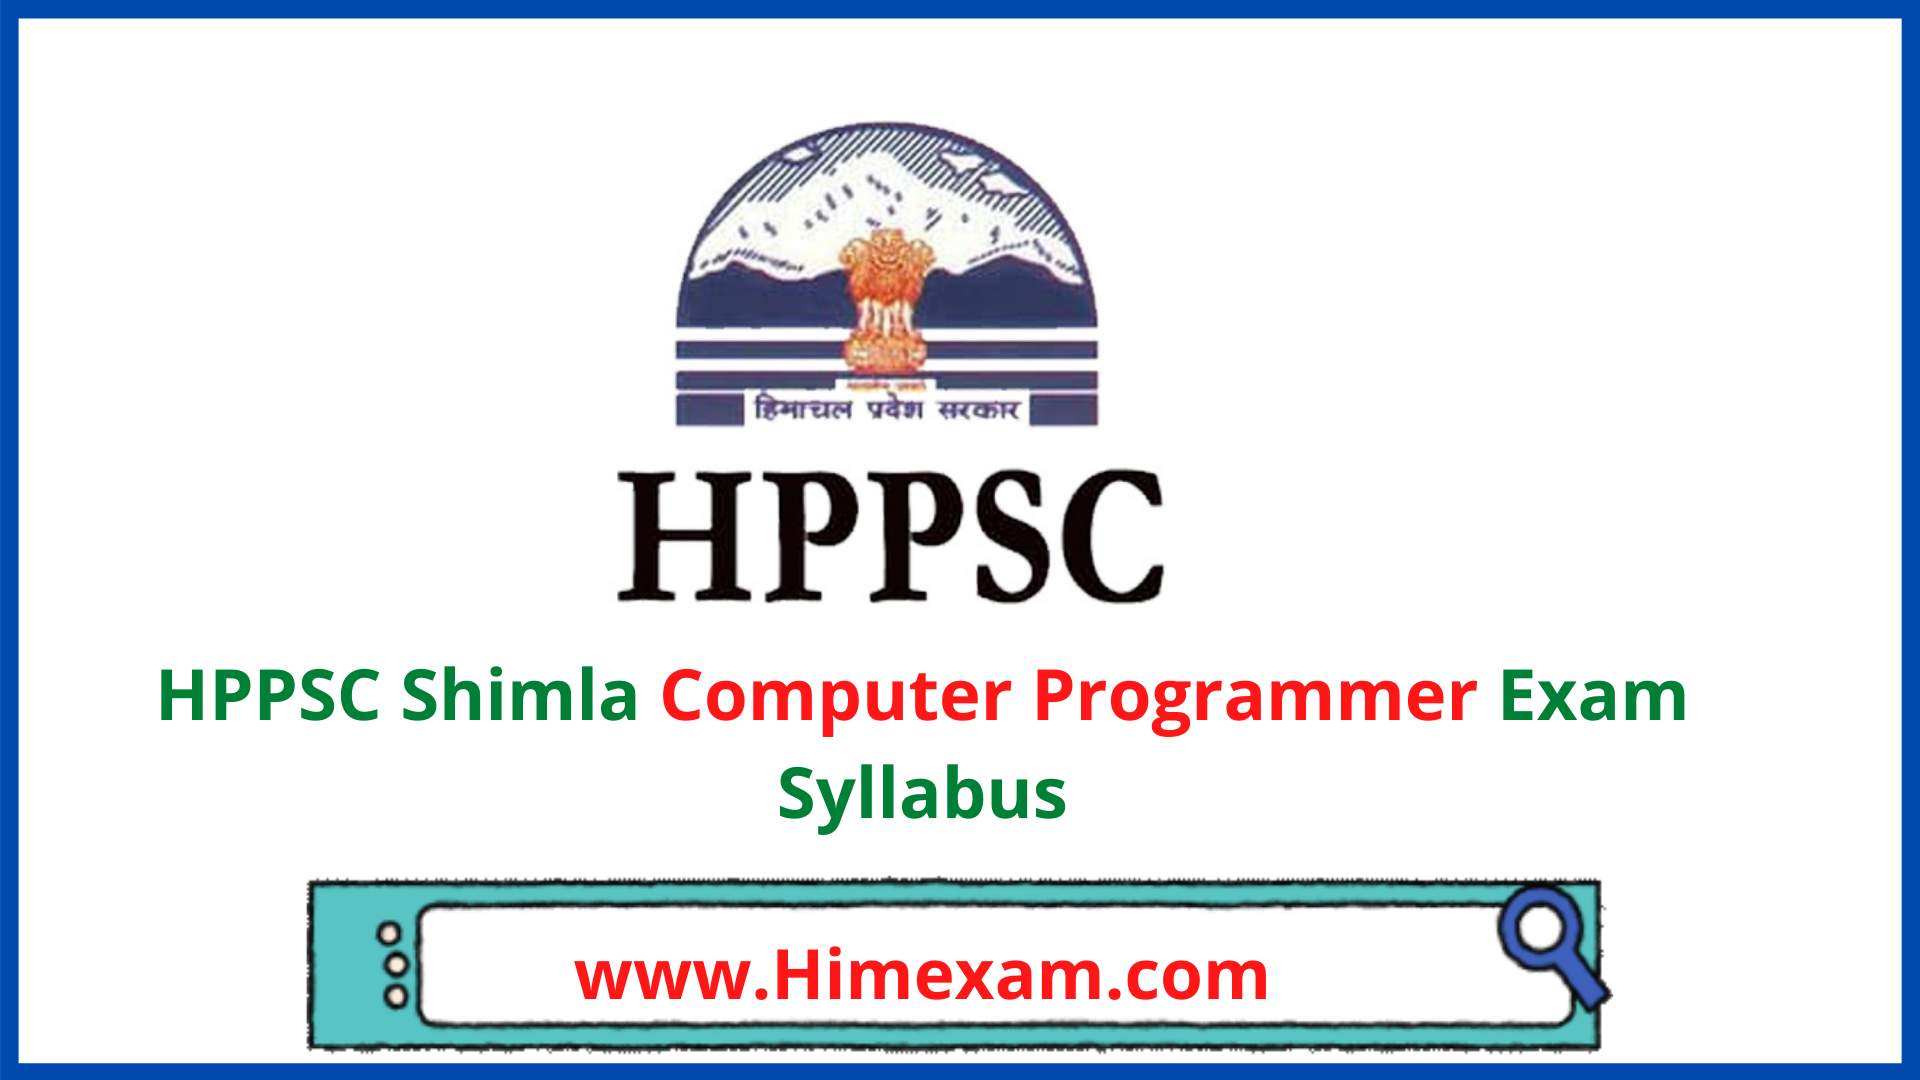 HPPSC Shimla Computer Programmer(Jal Shakti Vibhag) Exam Syllabus